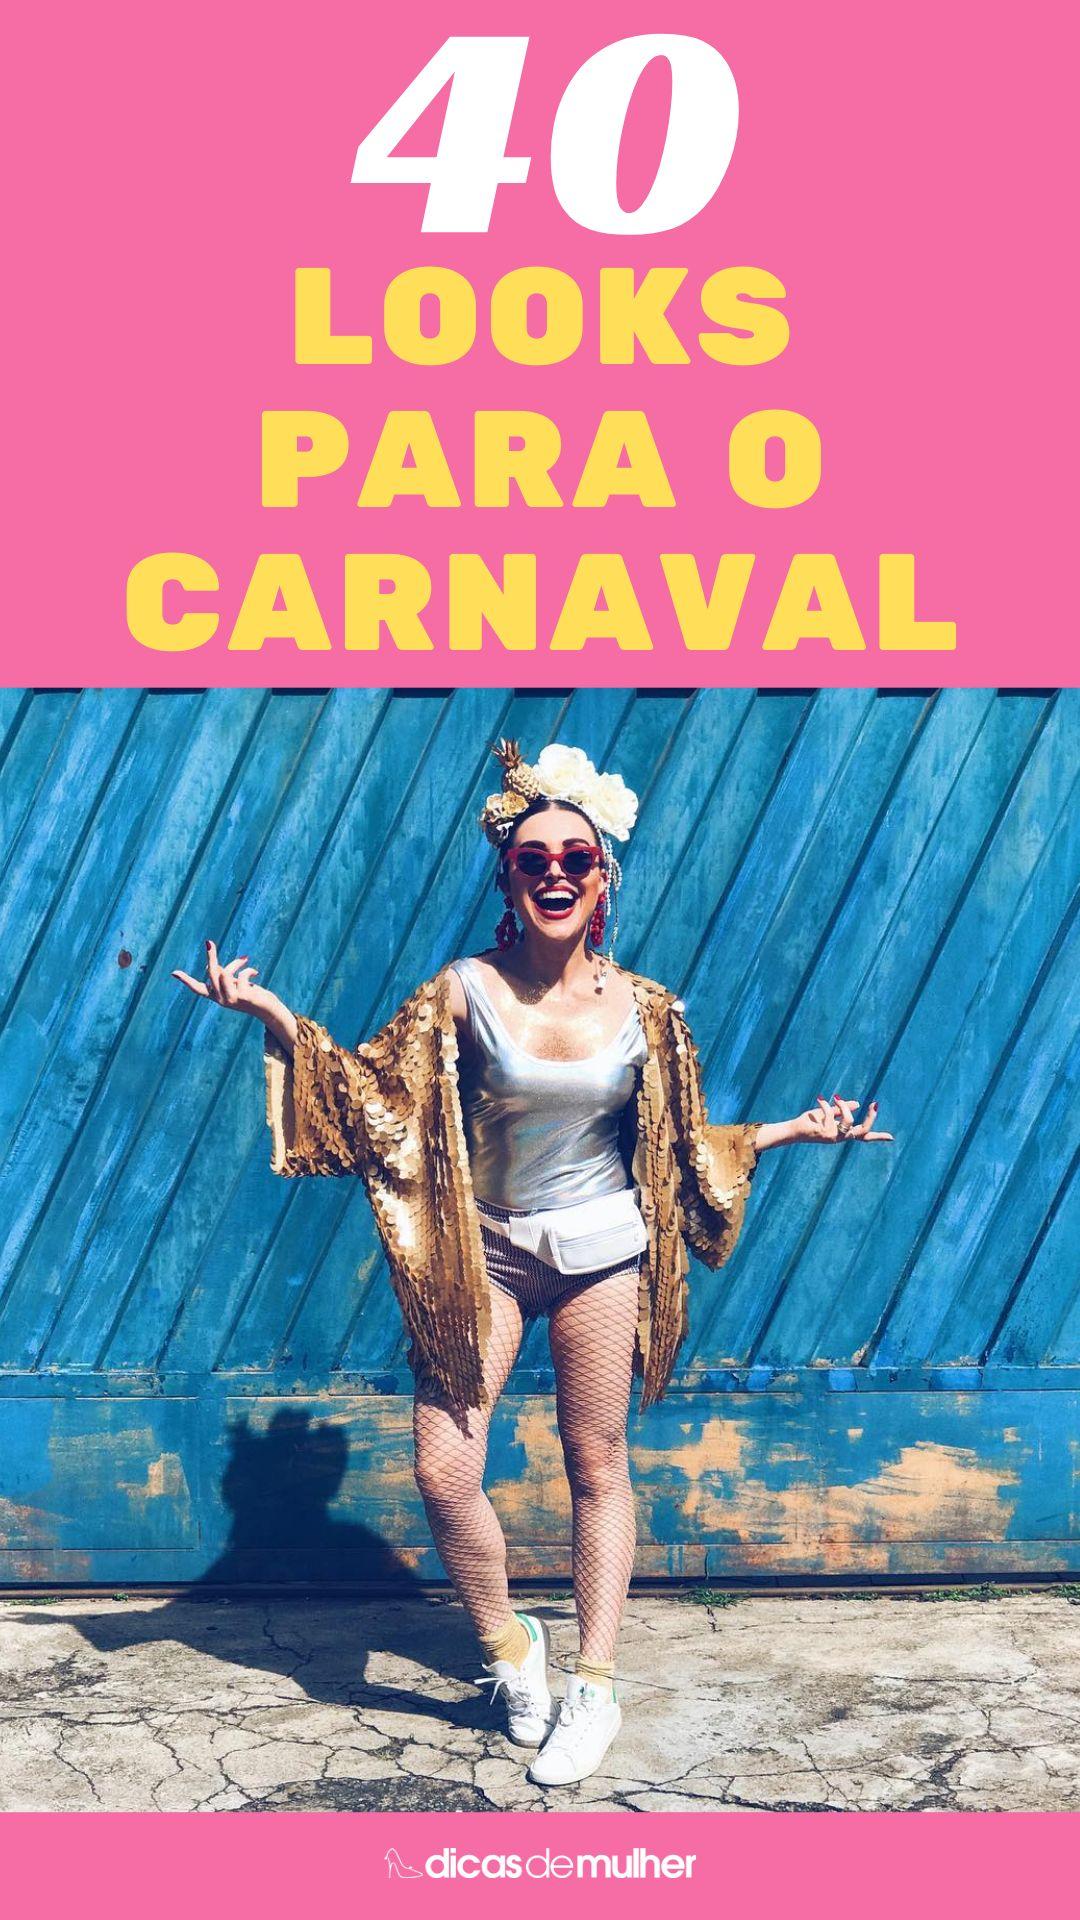 Looks para o carnaval   #look #carnaval